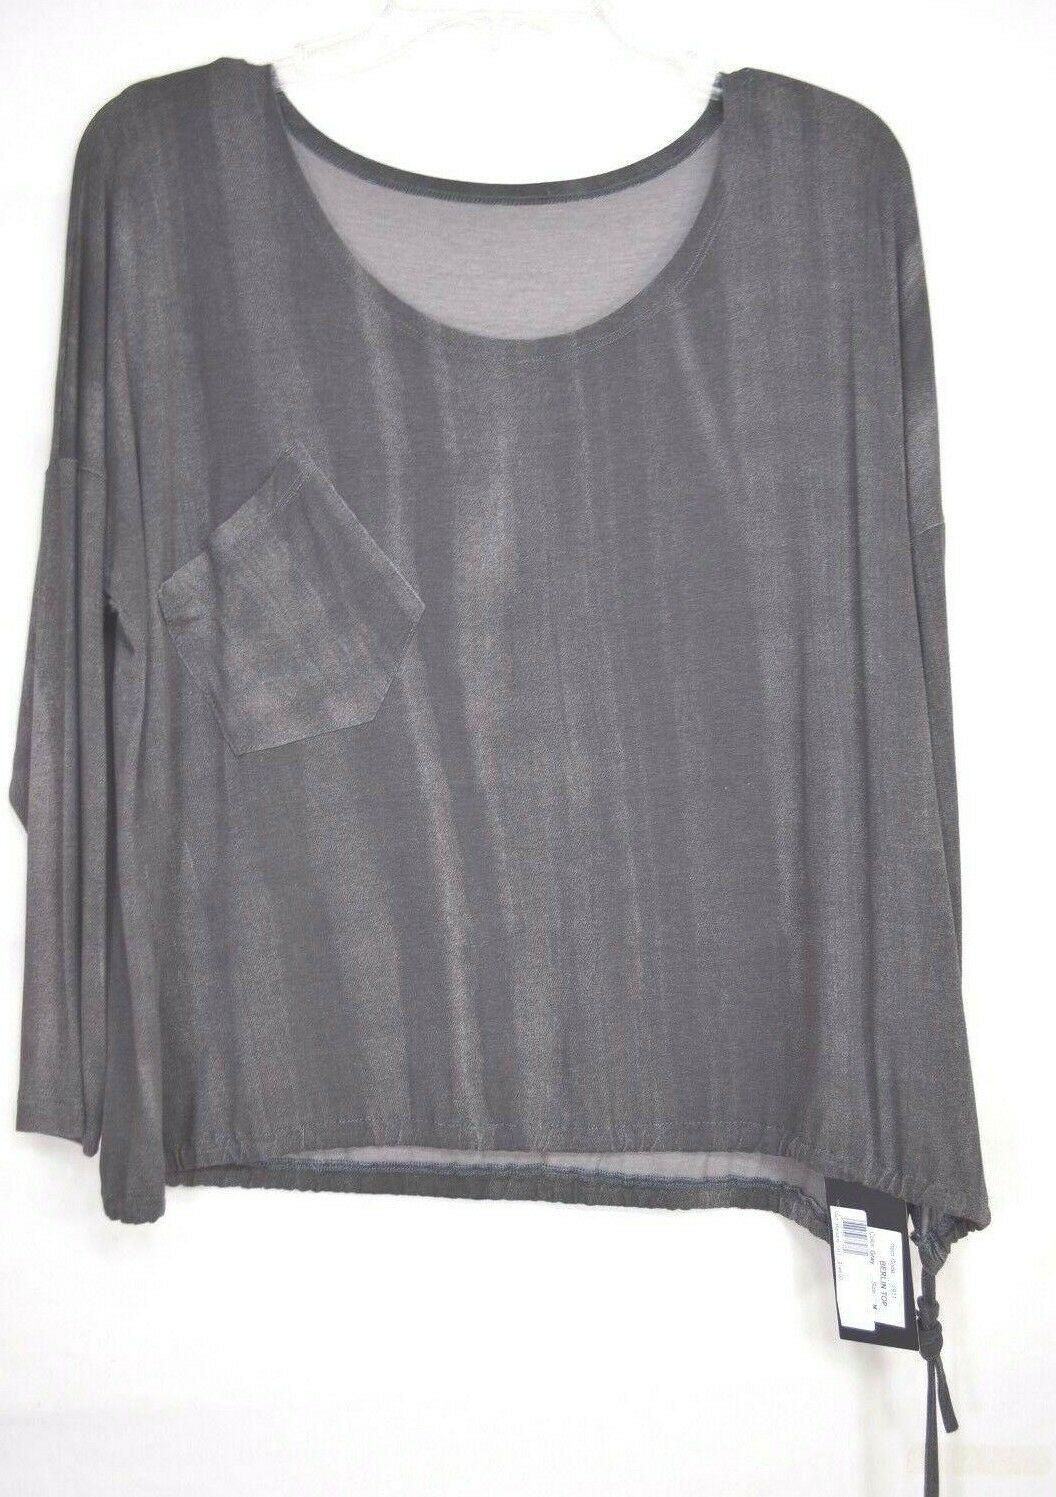 Matti Mamane top SZ M NWT dark gray drawstring waist scoop neck 3/4 sleeve new